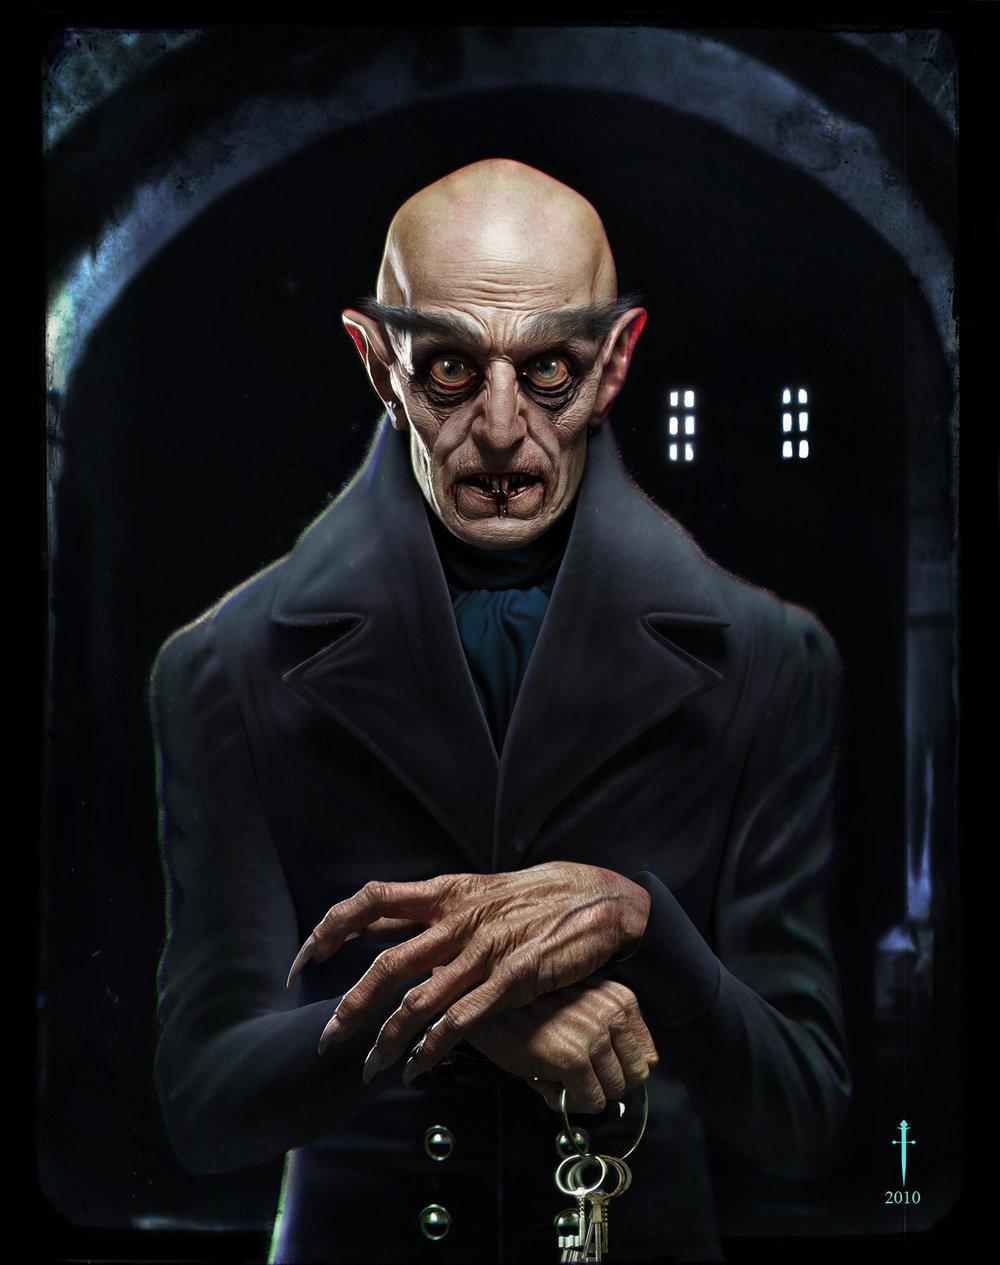 Count Orlok portrait by Daniel Crossland, 2010